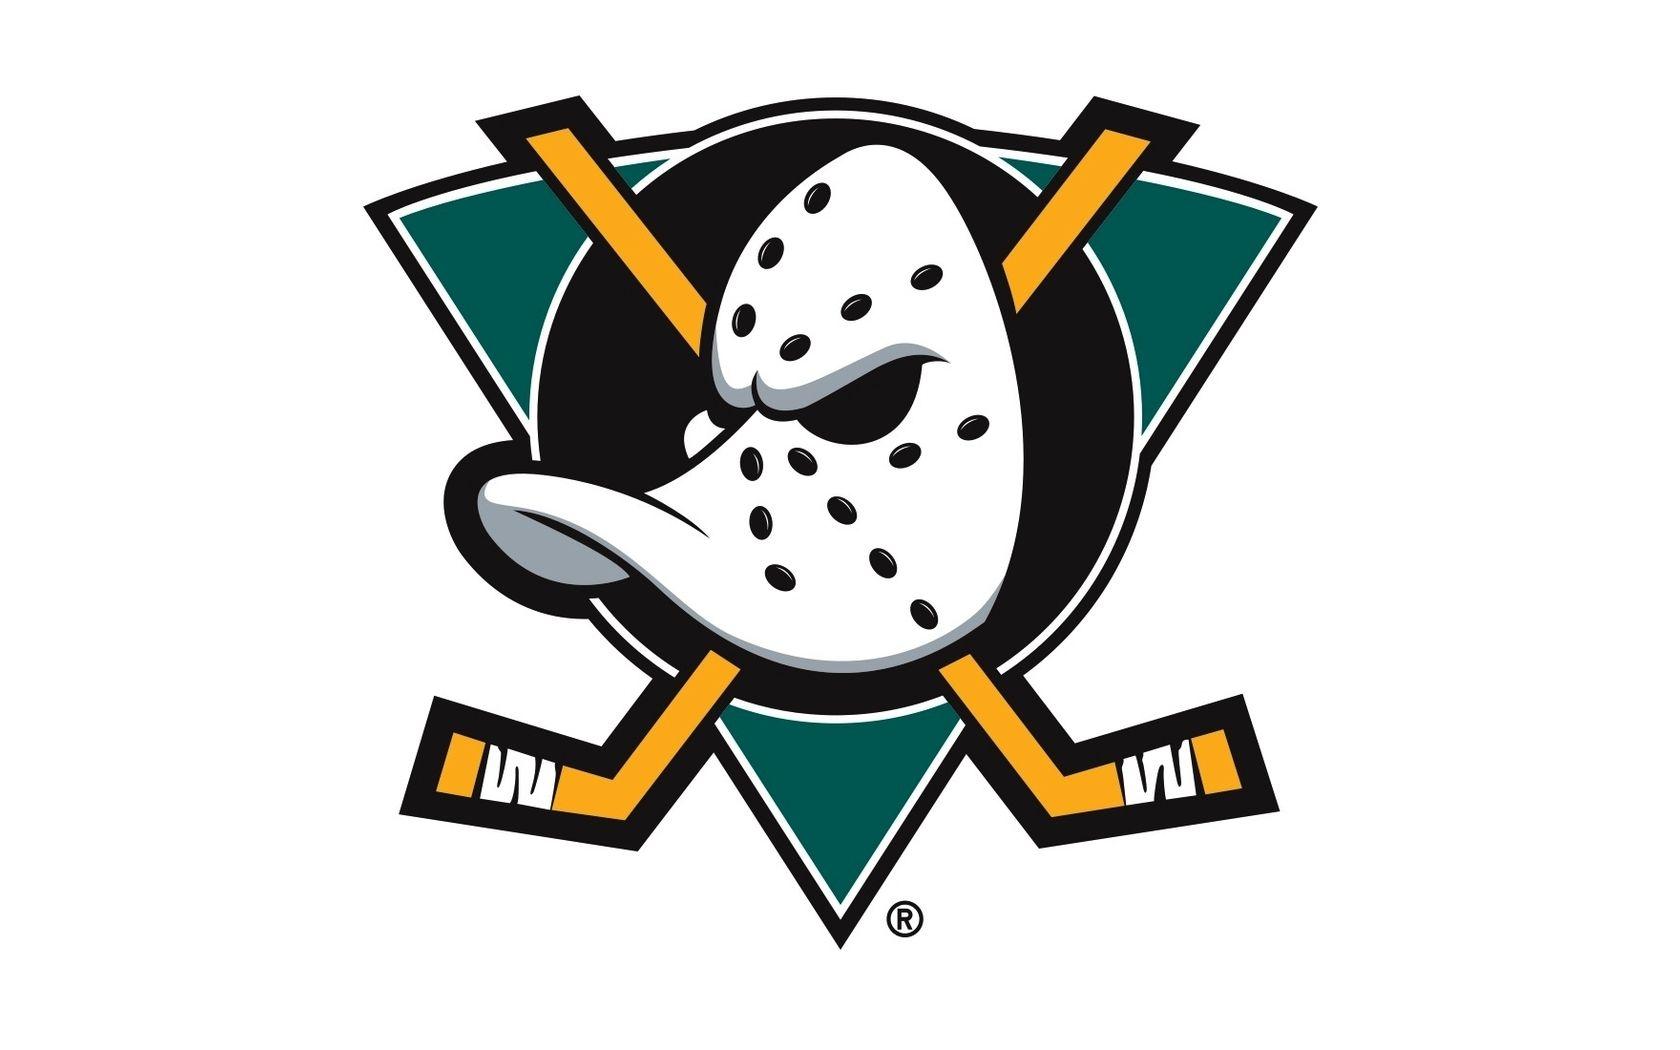 Hockey Logos Anaheim Ducks Wallpaper Nhl Hockey Sports Game Logo Mask Stick Hockey Logos Nhl Logos Duck Logo